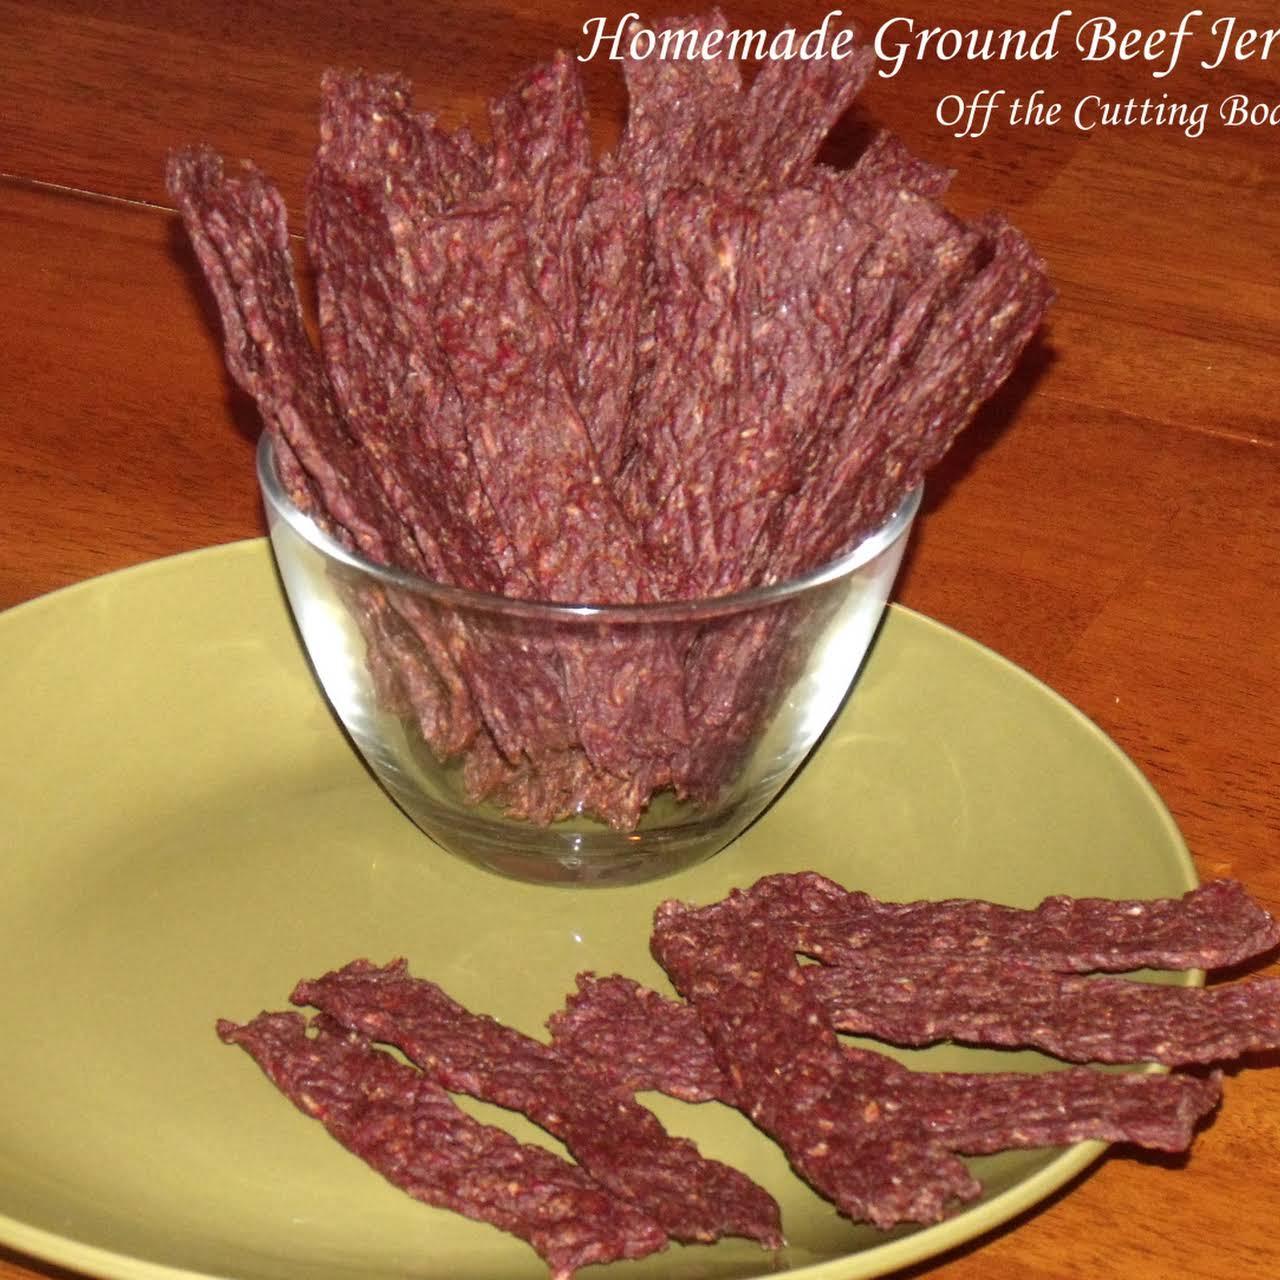 Homemade Ground Beef Jerky